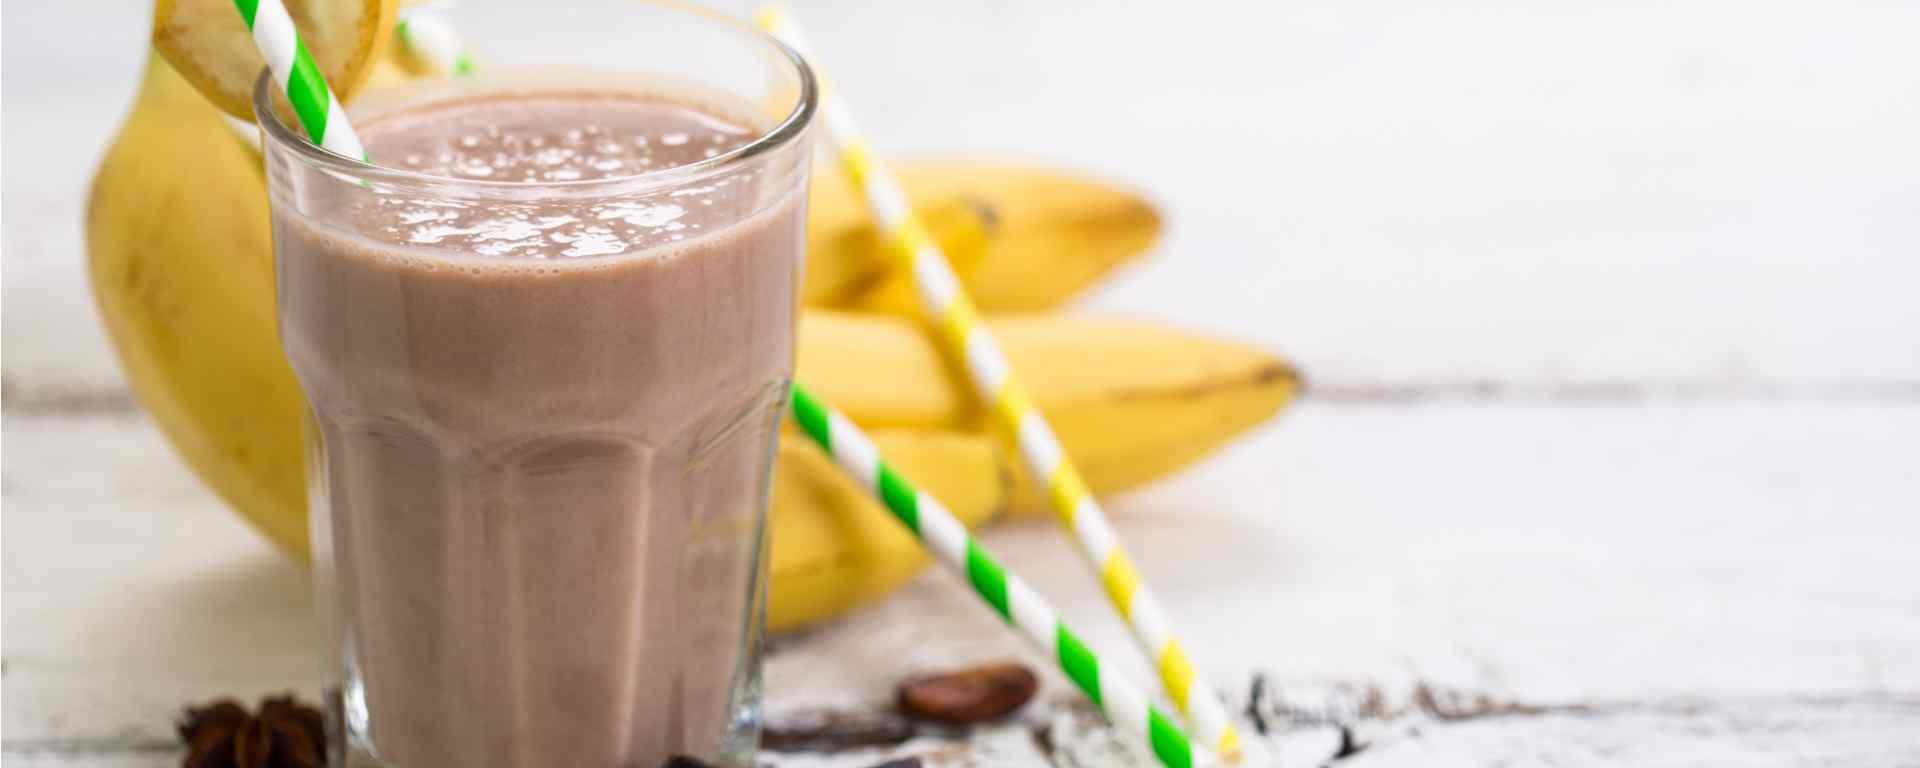 Photo for - Banana Split Shake